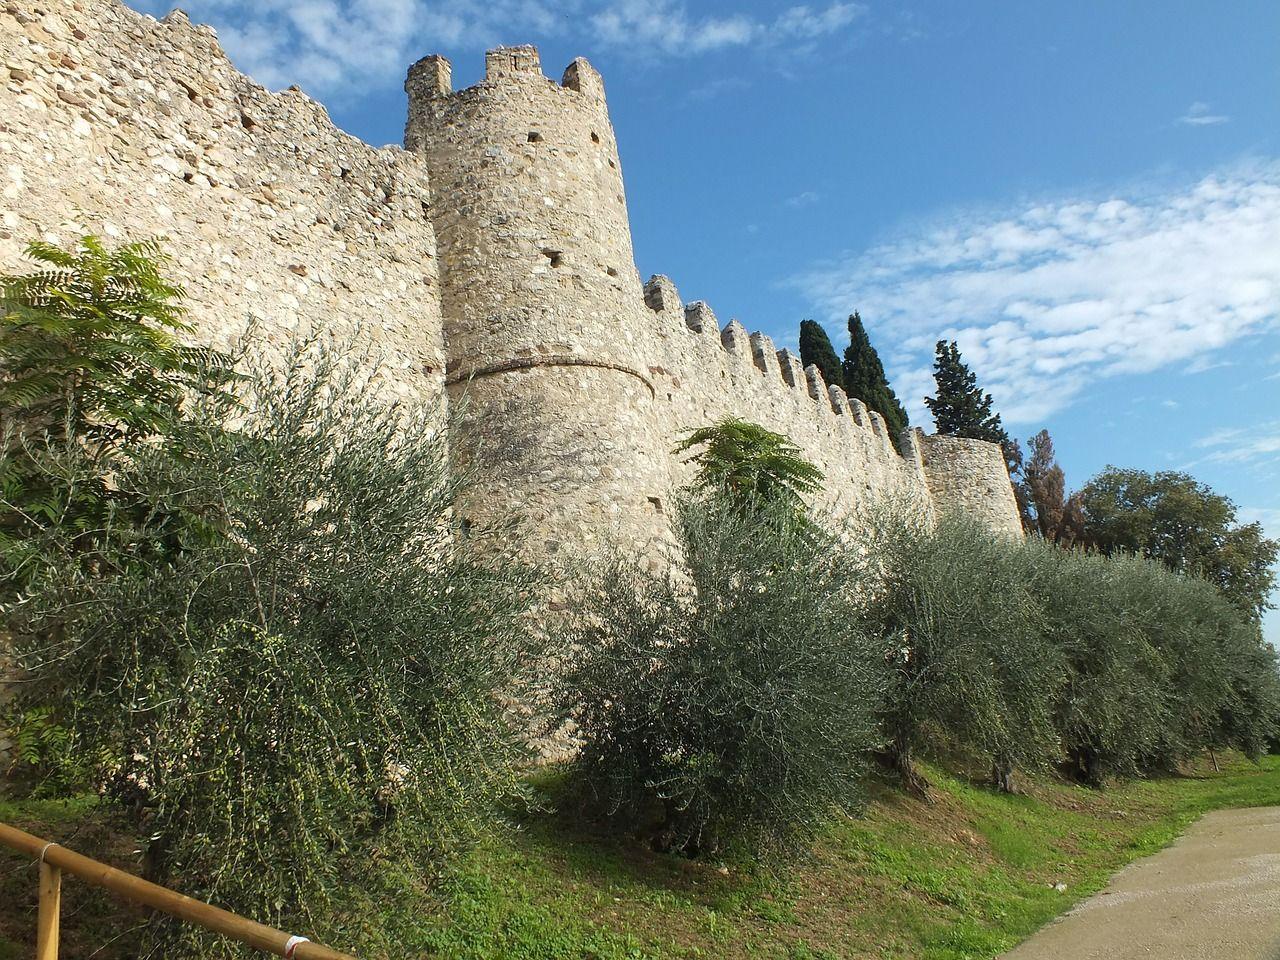 Italy, Moniga Del Garda, Garda, Castle, Italy italy,